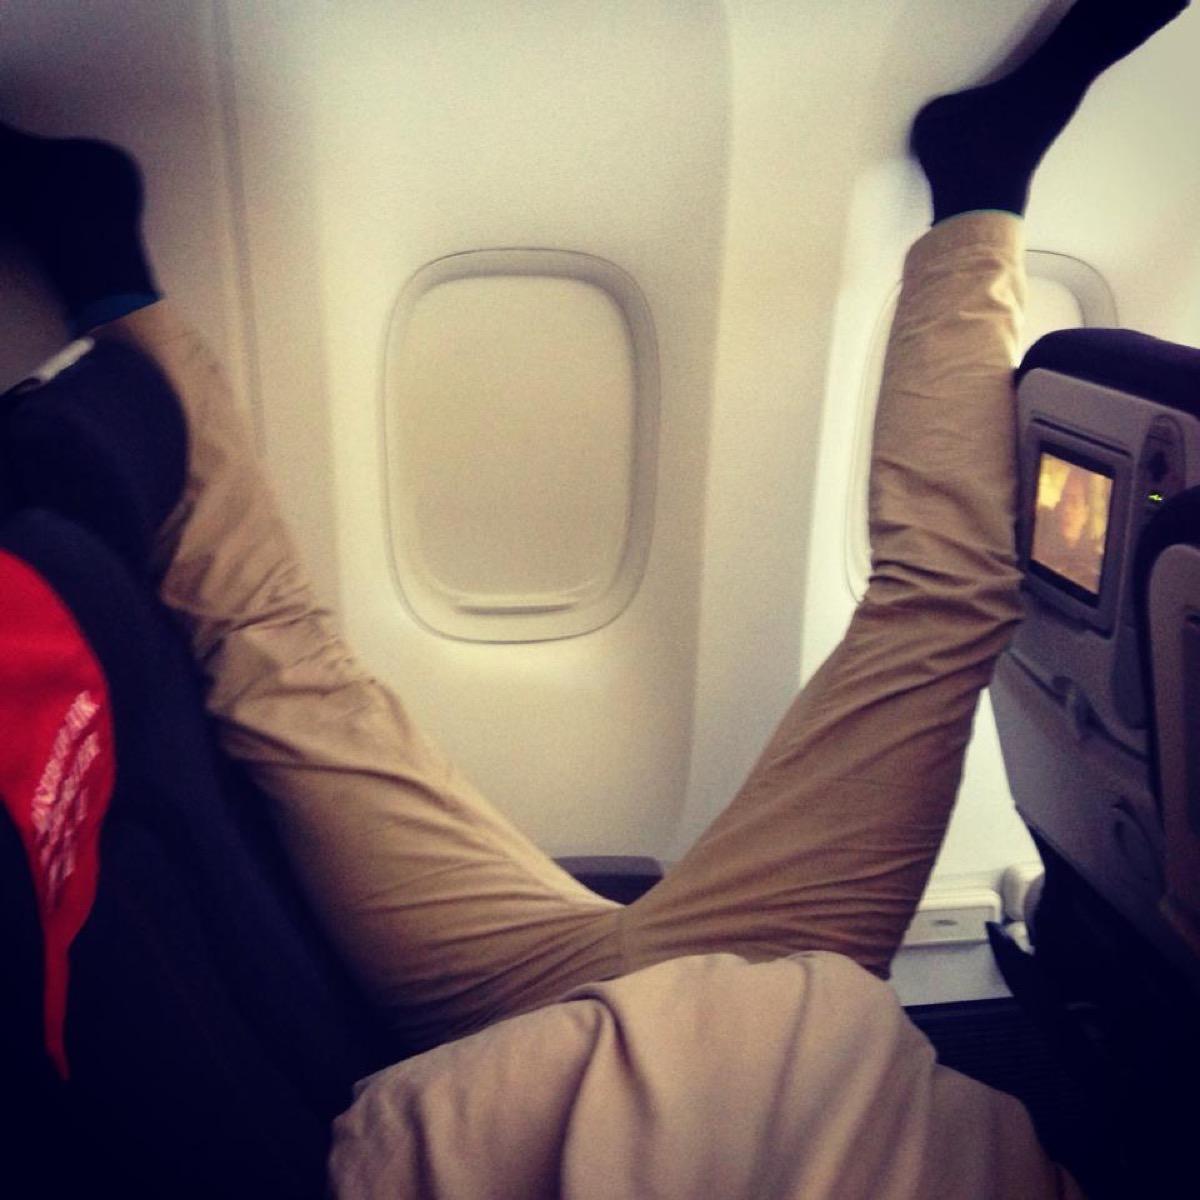 Man manspreading on plane photos of terrible airplane passengers